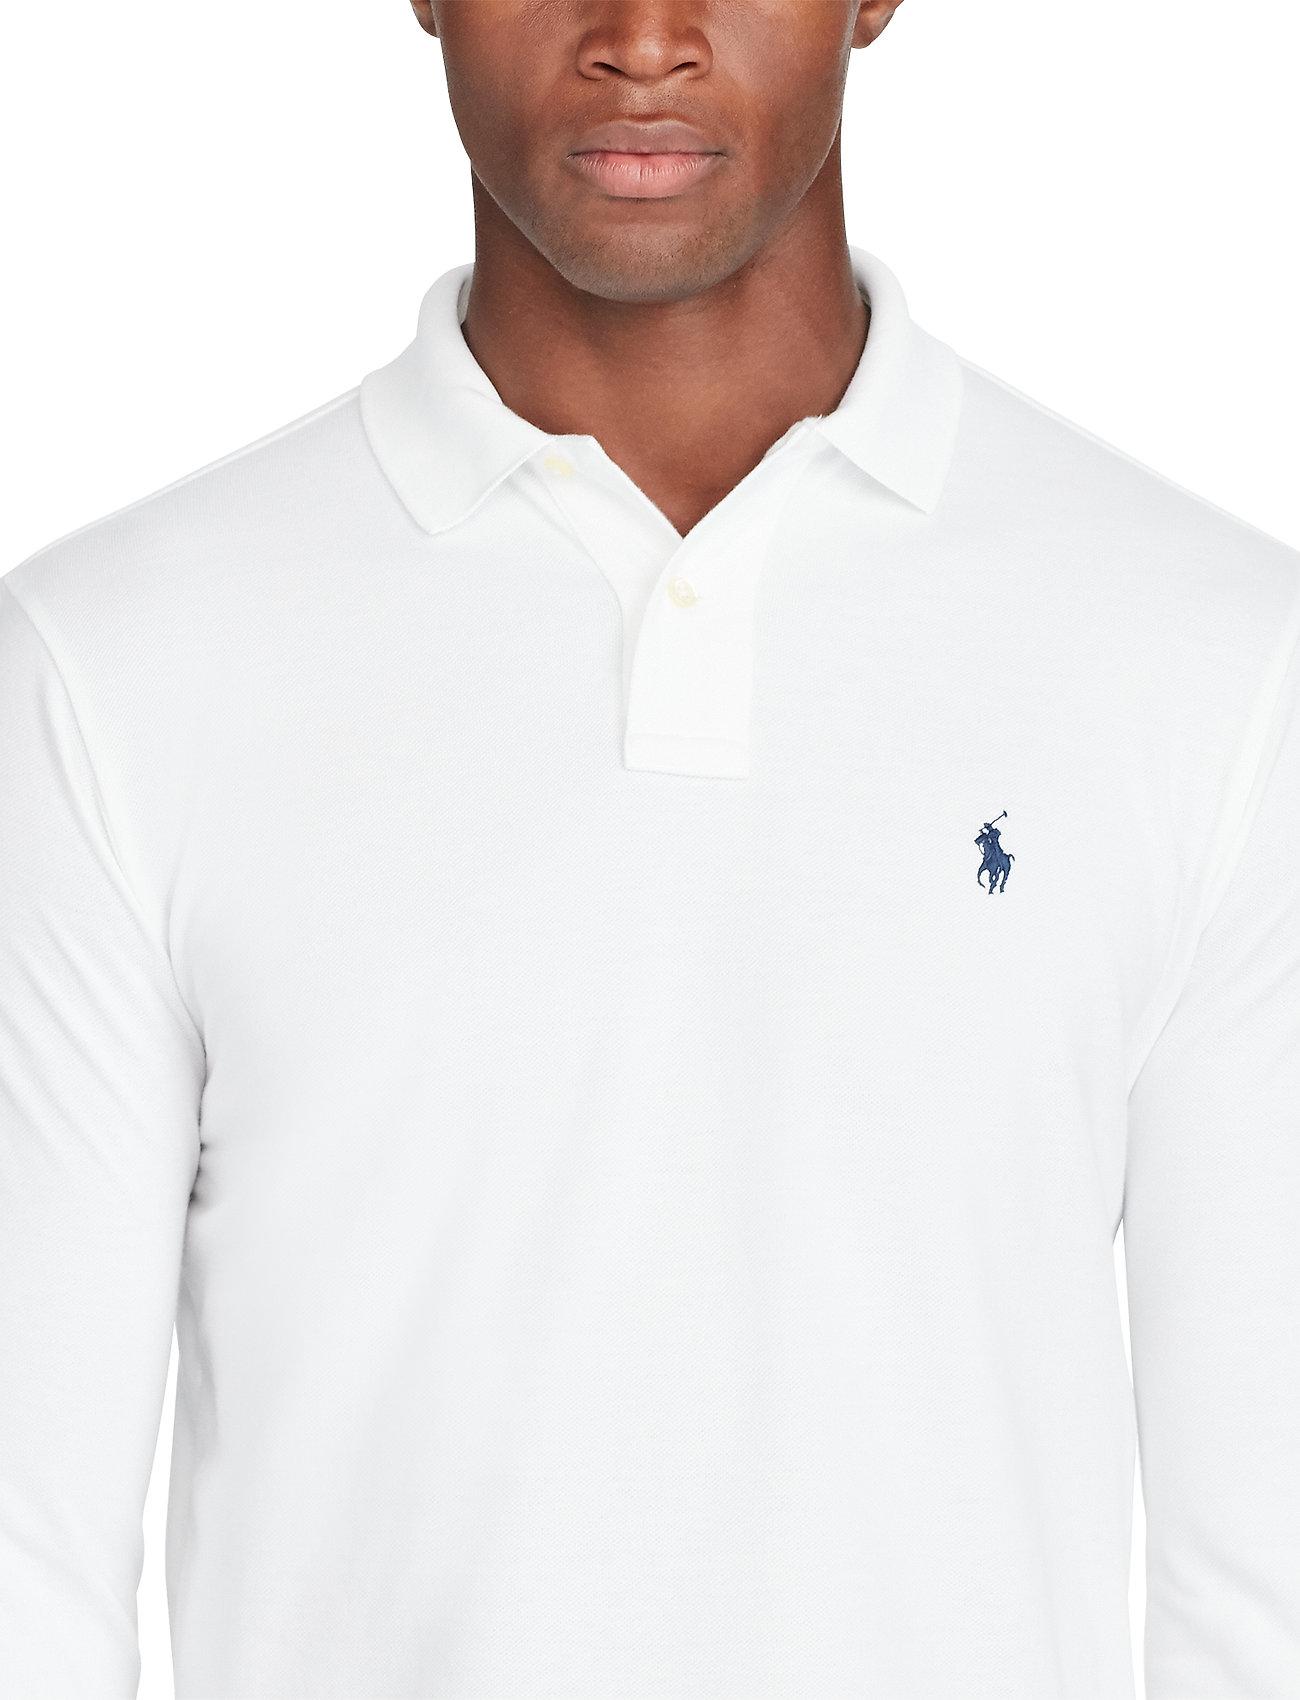 Polo Ralph Lauren    Slim Fit Mesh Long-Sleeve Polo  - Poloshirts    WHITE